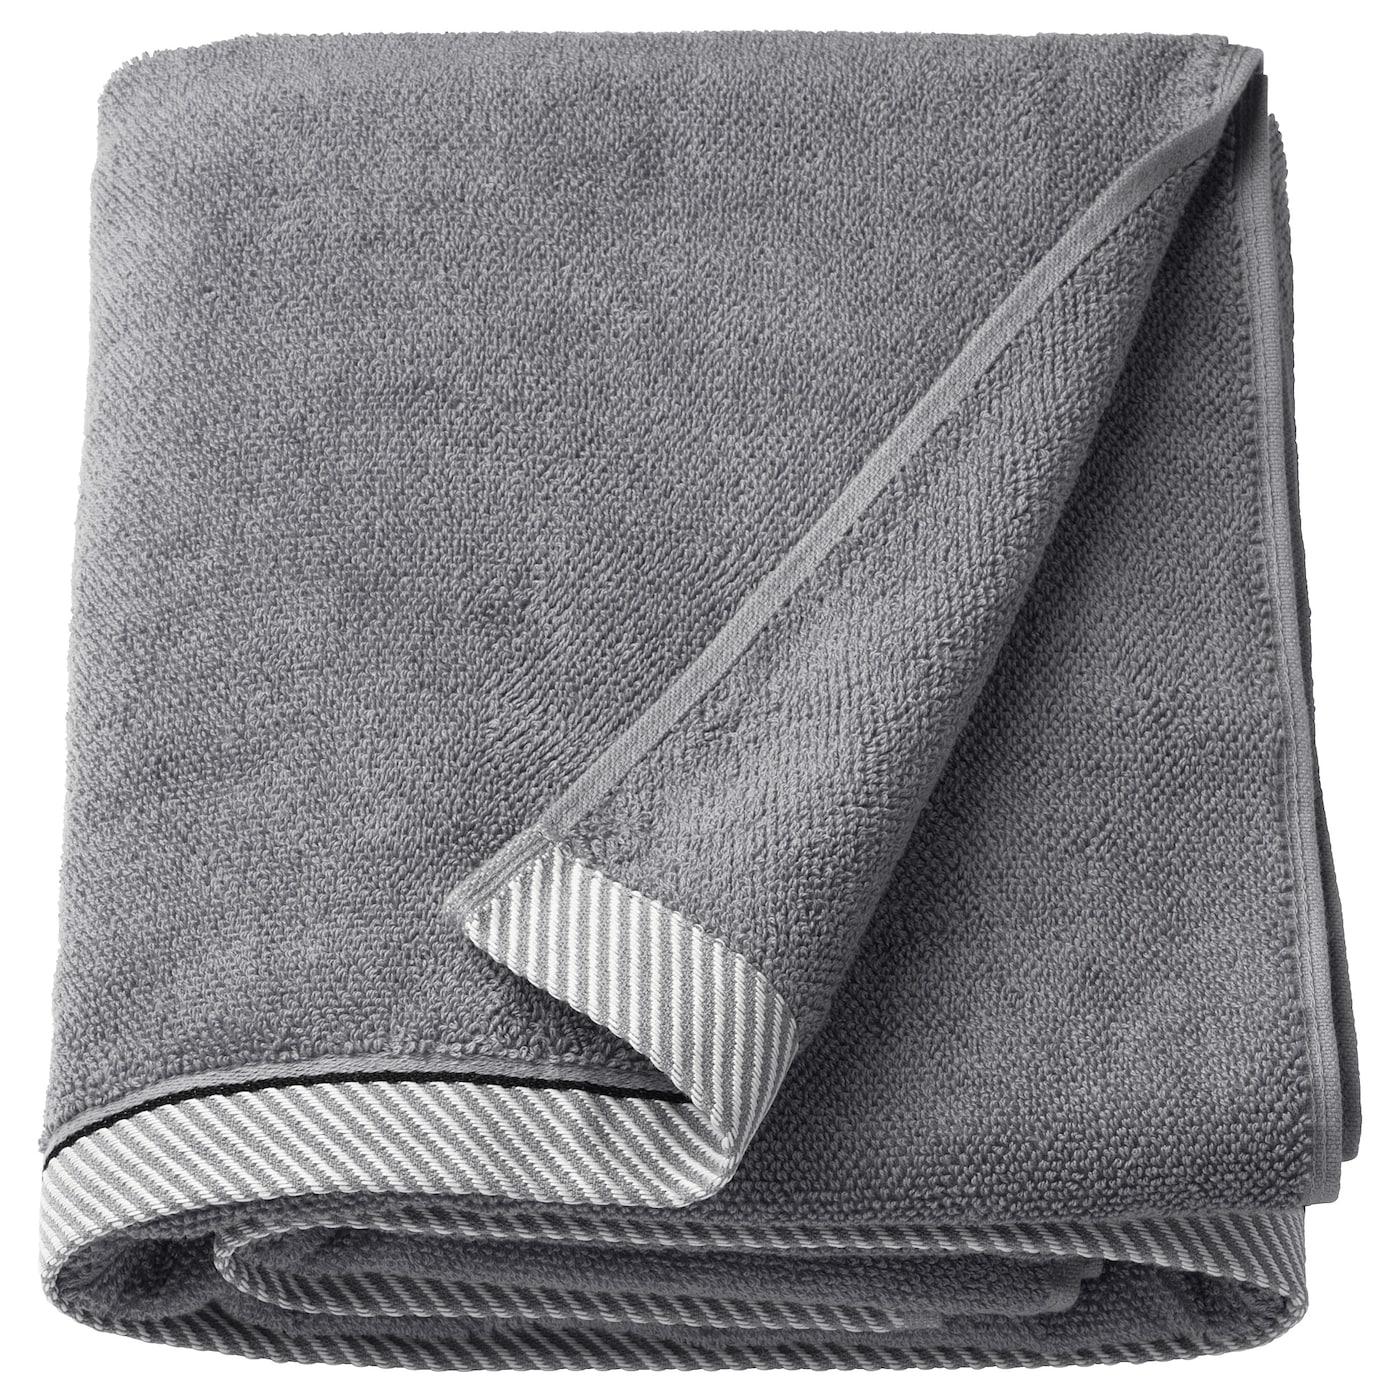 VIKFJÄRD Toalla de baño - gris - IKEA